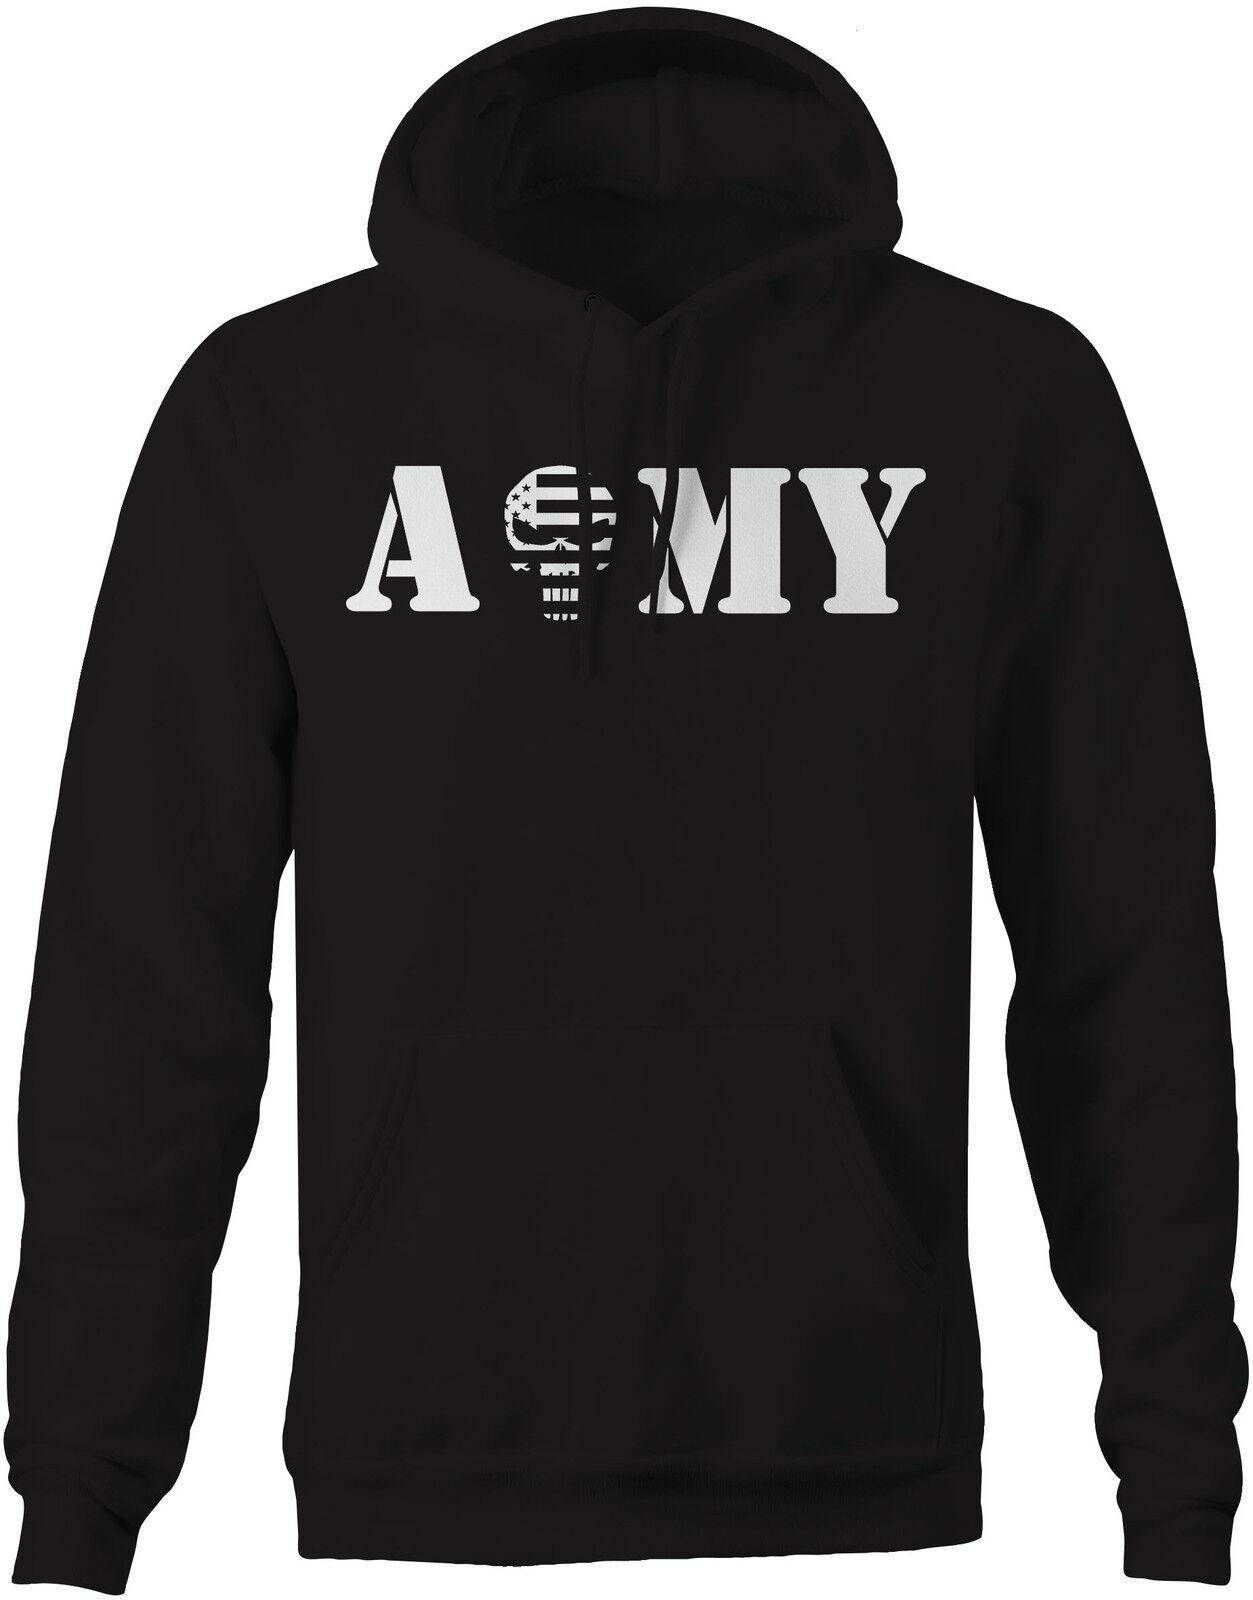 ARMY Punisher US Flag Spike Skull - Military Police Sweatshirt